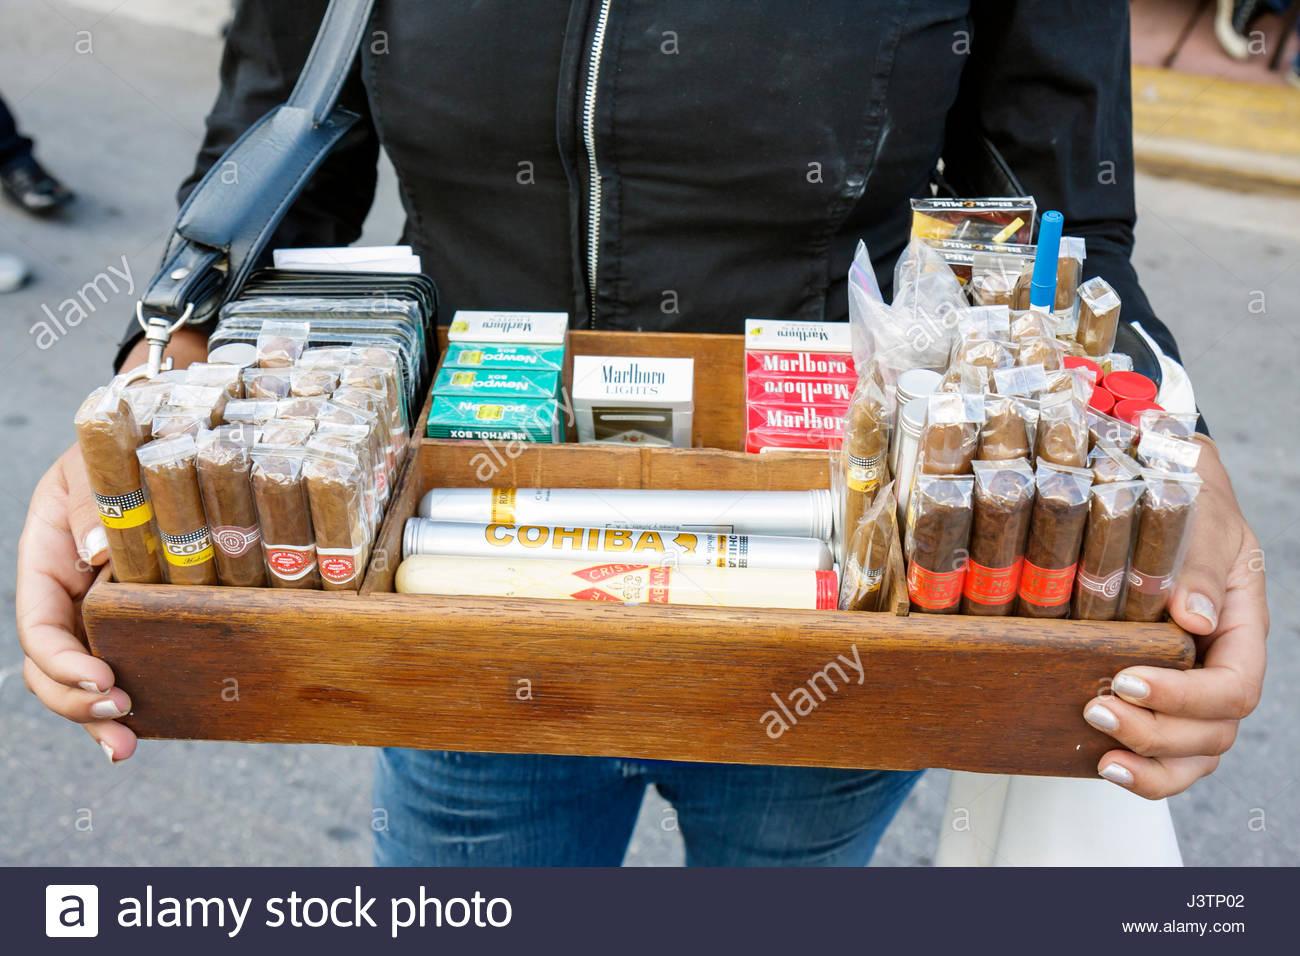 120s cigarettes Marlboro buy